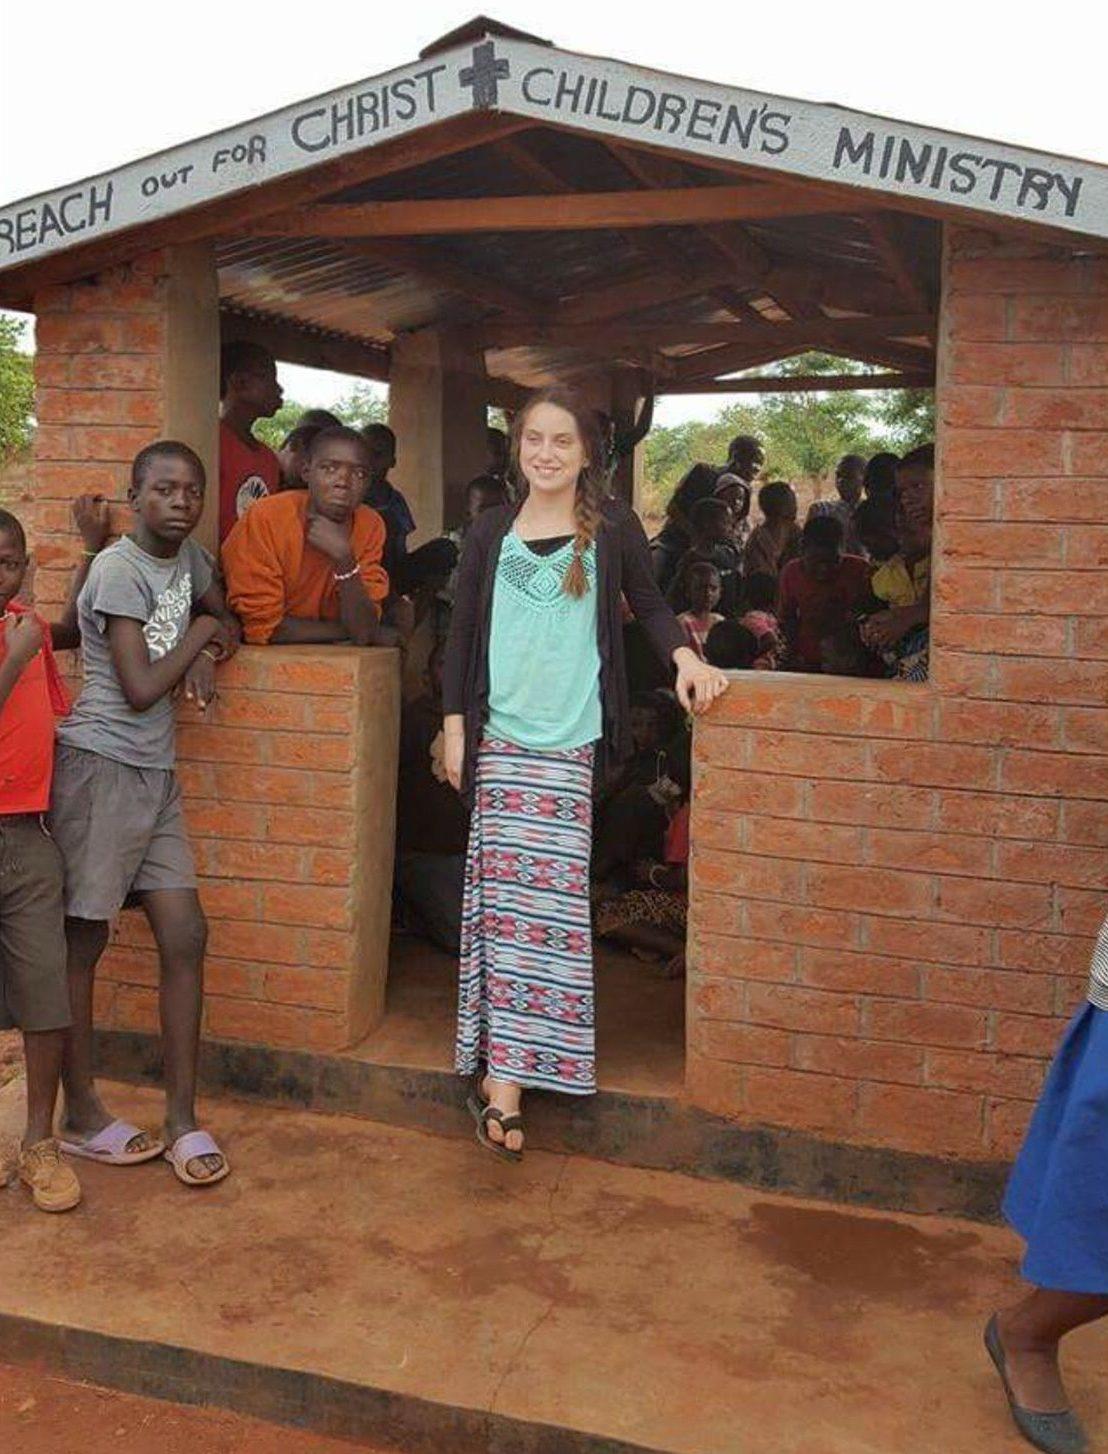 1ST CHILDREN'S MINISTRY BUILDING